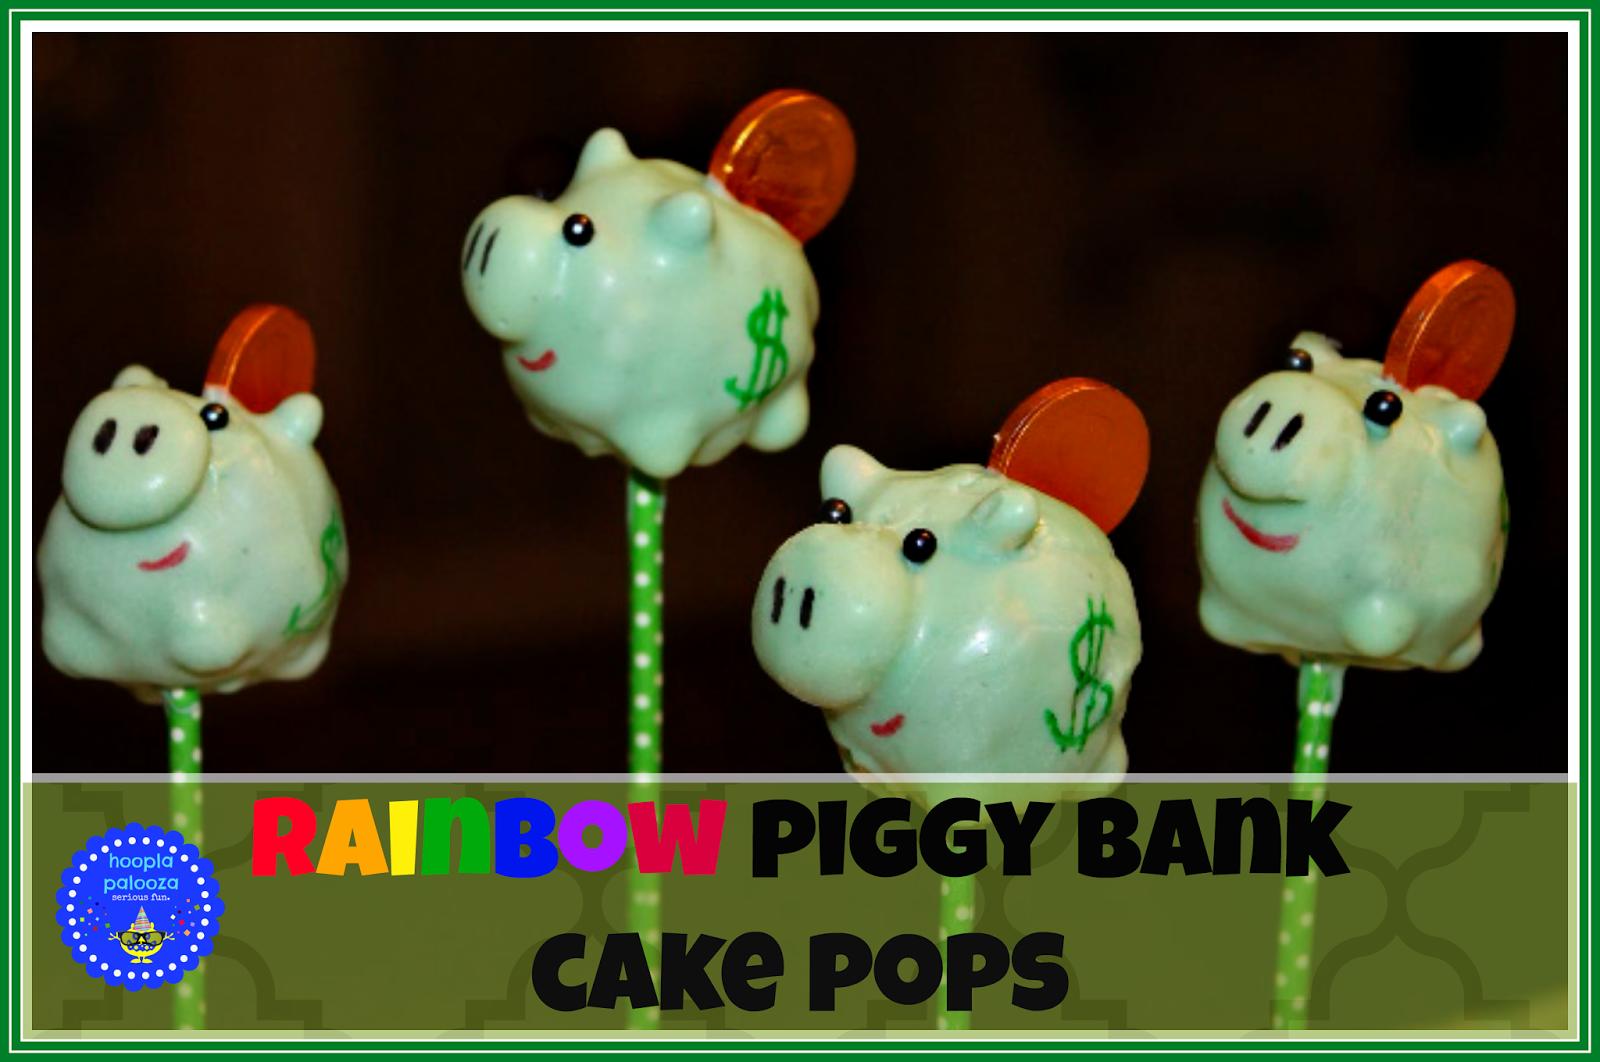 http://hooplapalooza.blogspot.com/2014/03/rainbow-piggy-bank-cake-pops.html